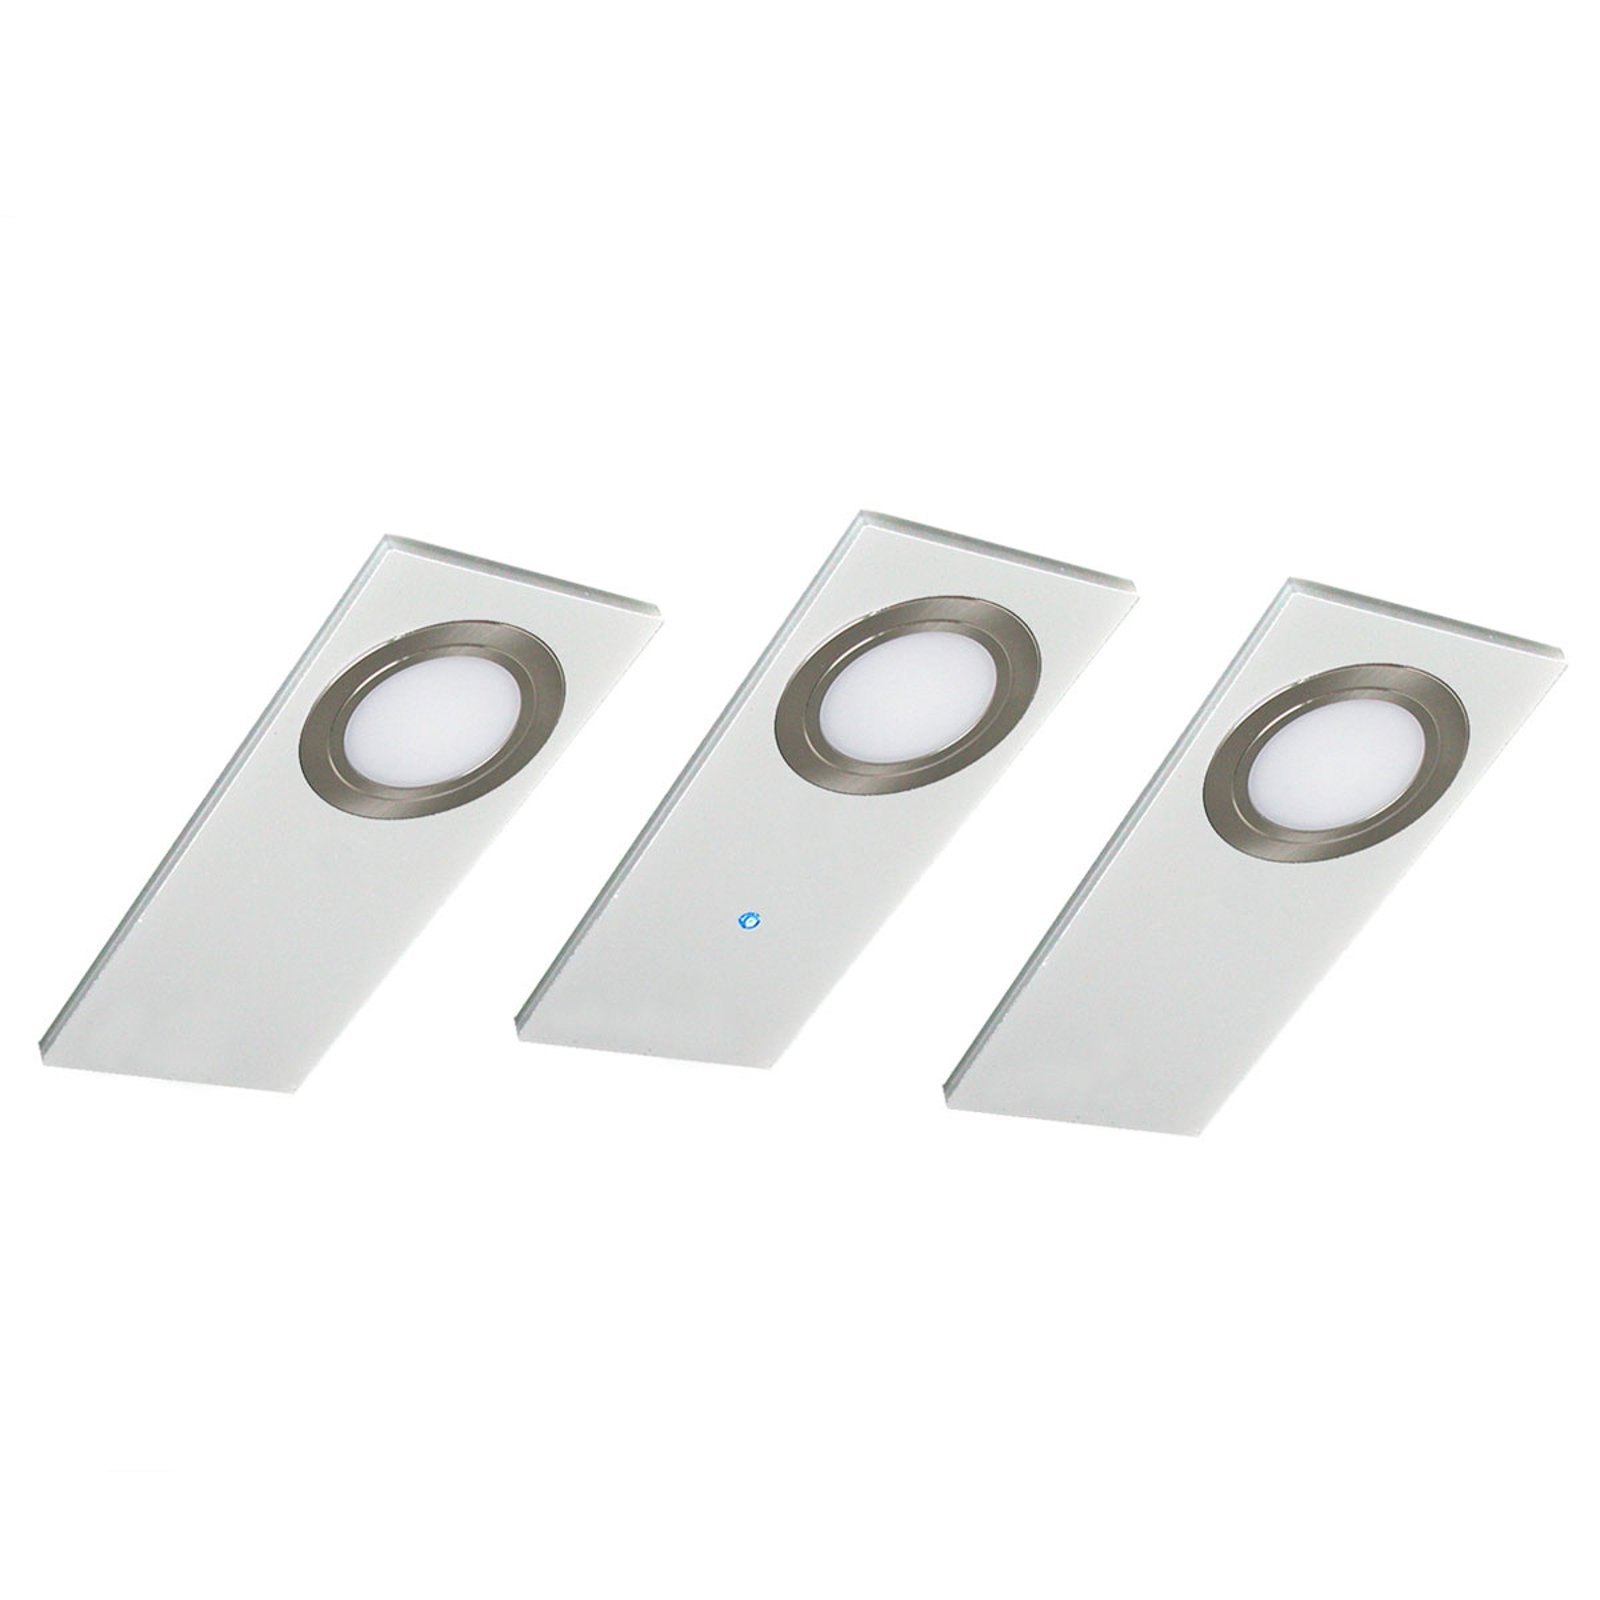 Flat LED-benkbelysning i 3er set, hvit